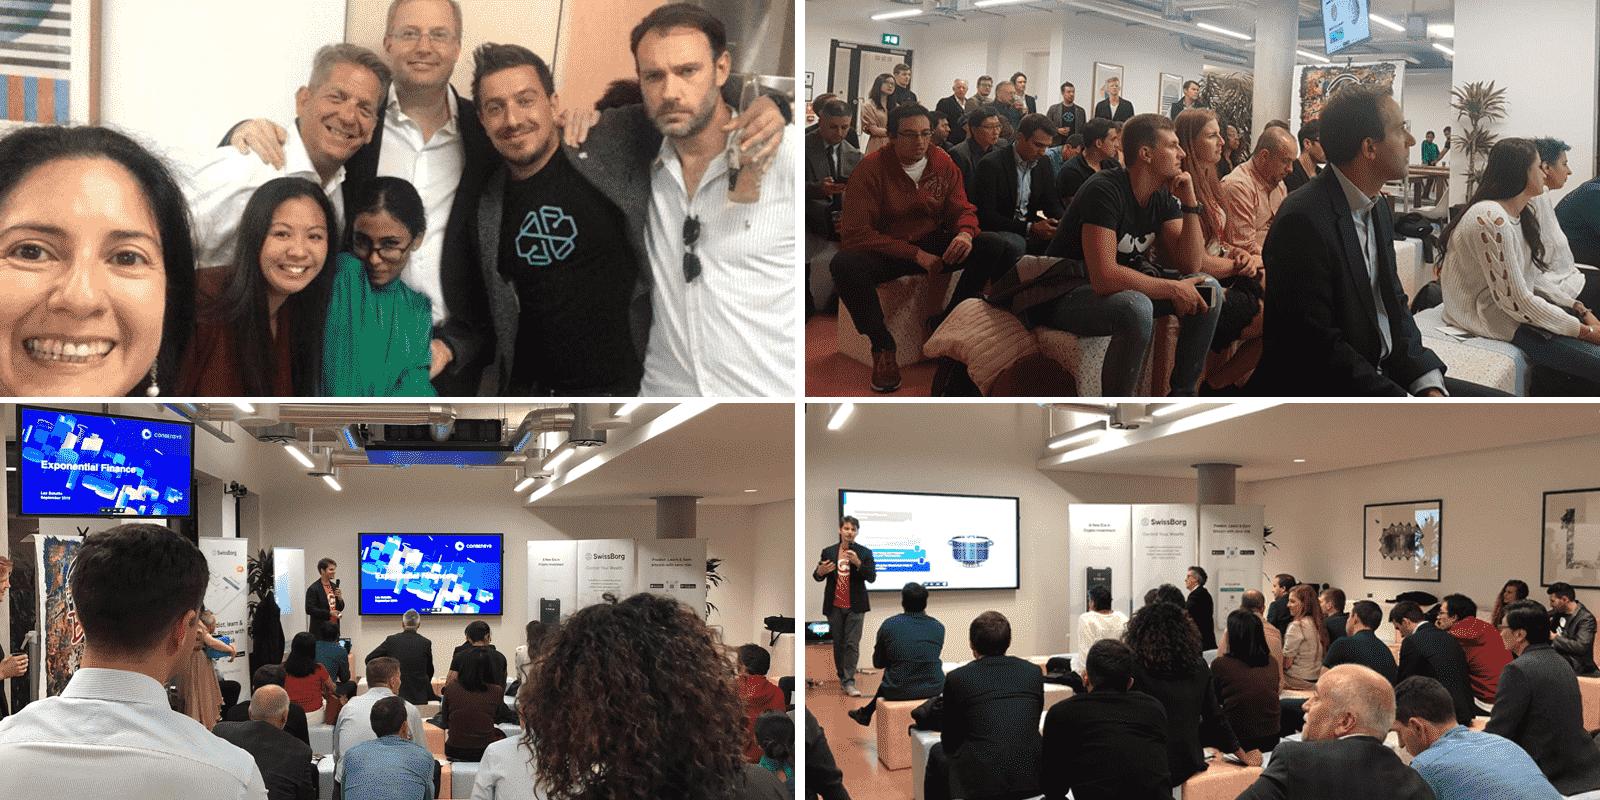 SwissBorg at the London Blockchain Forum: Crypto Reunion